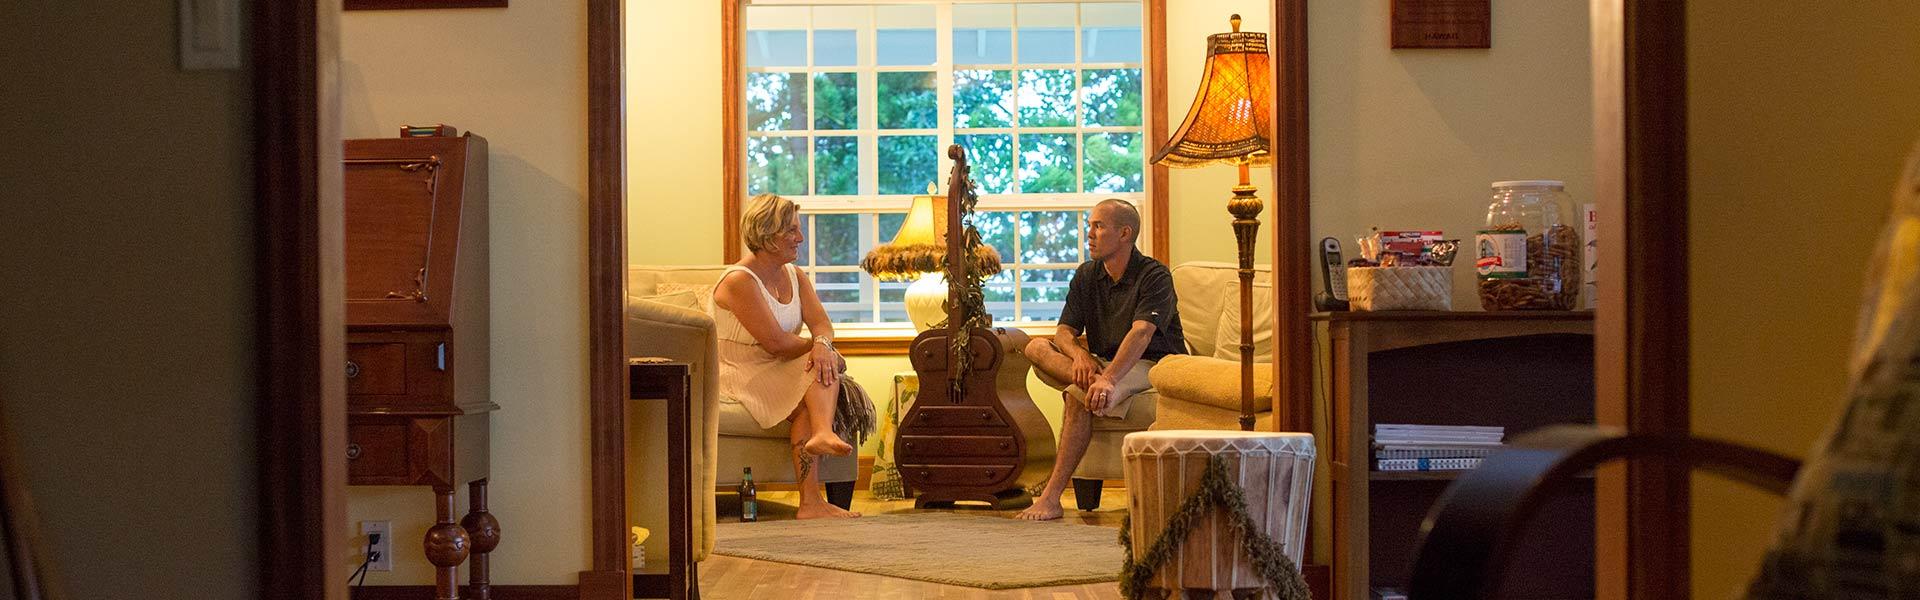 Couple relaxing in the parlor at Kalaekilohana Inn & Retreat